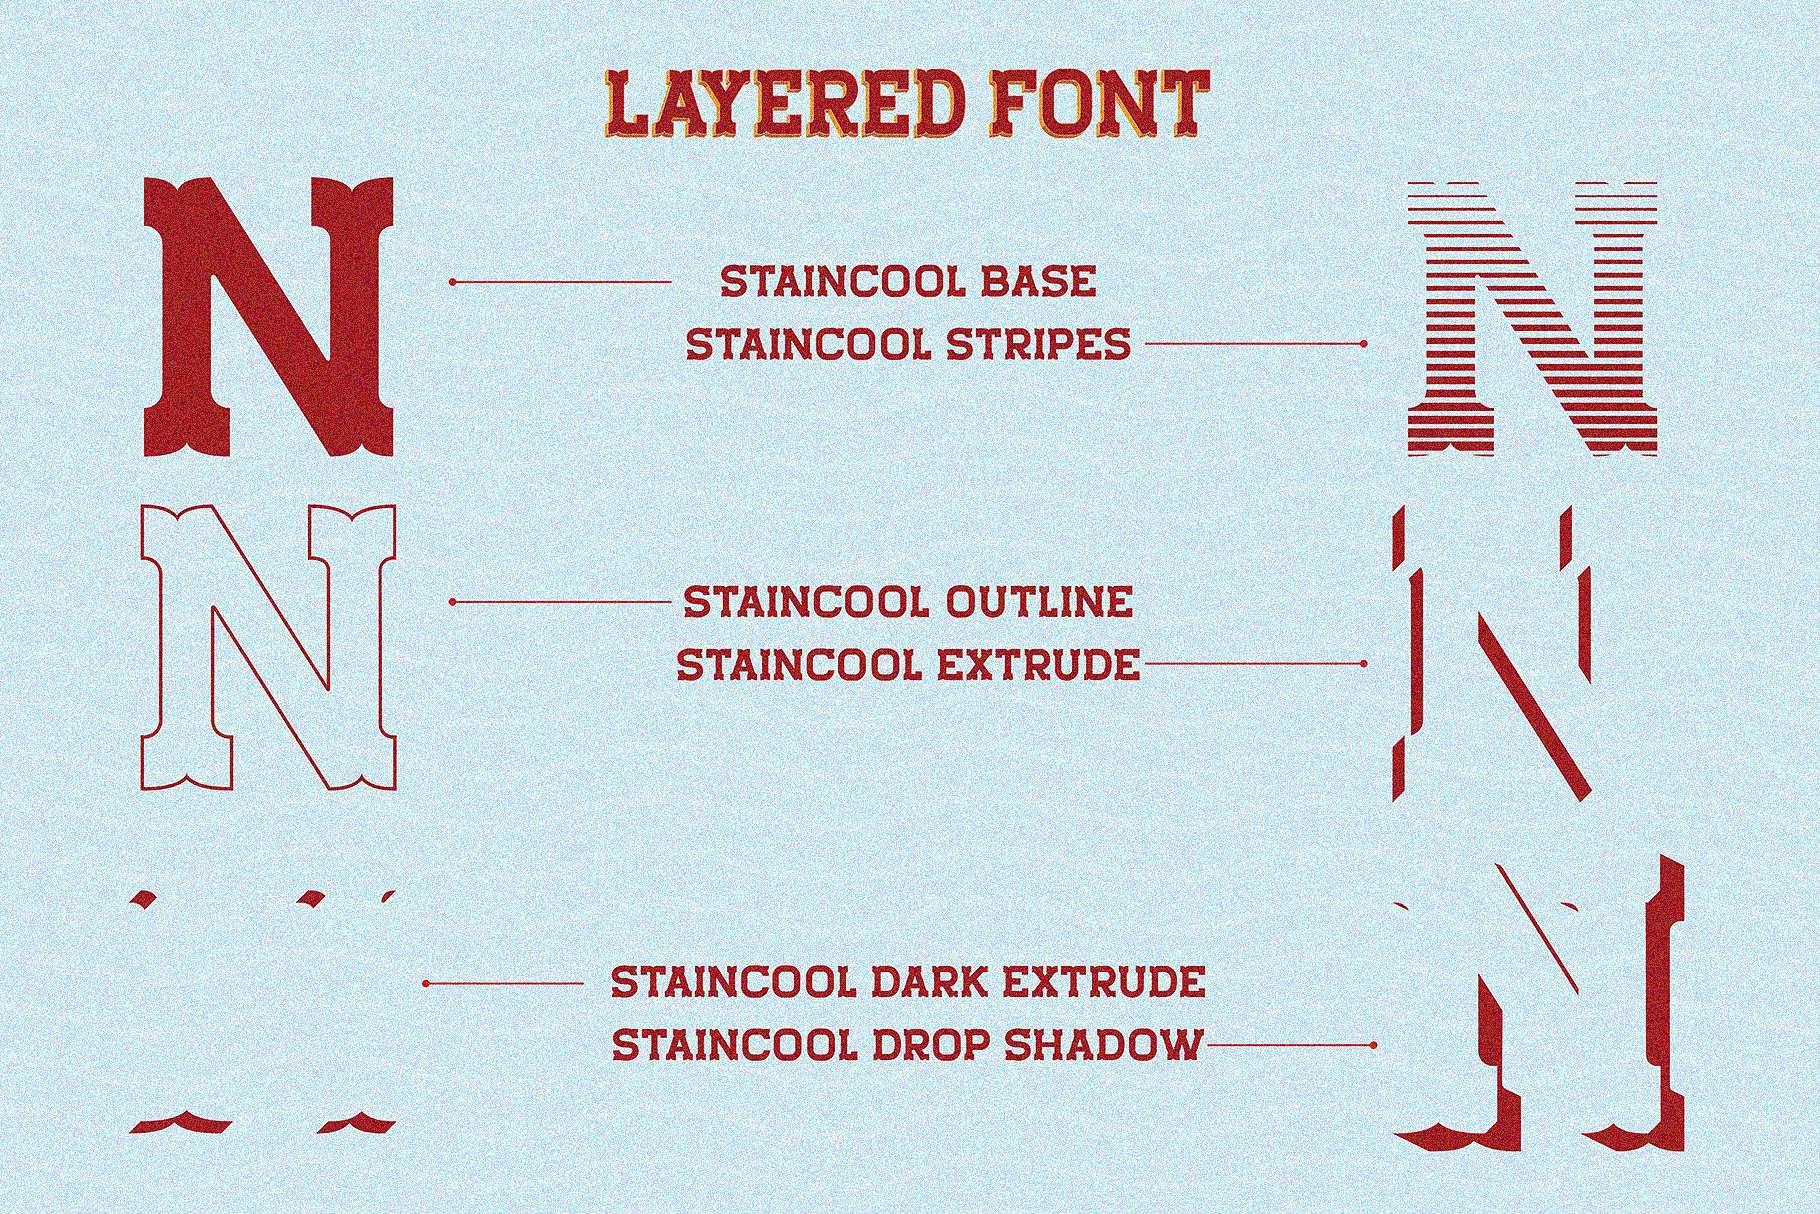 Staincool Layered шрифт скачать бесплатно